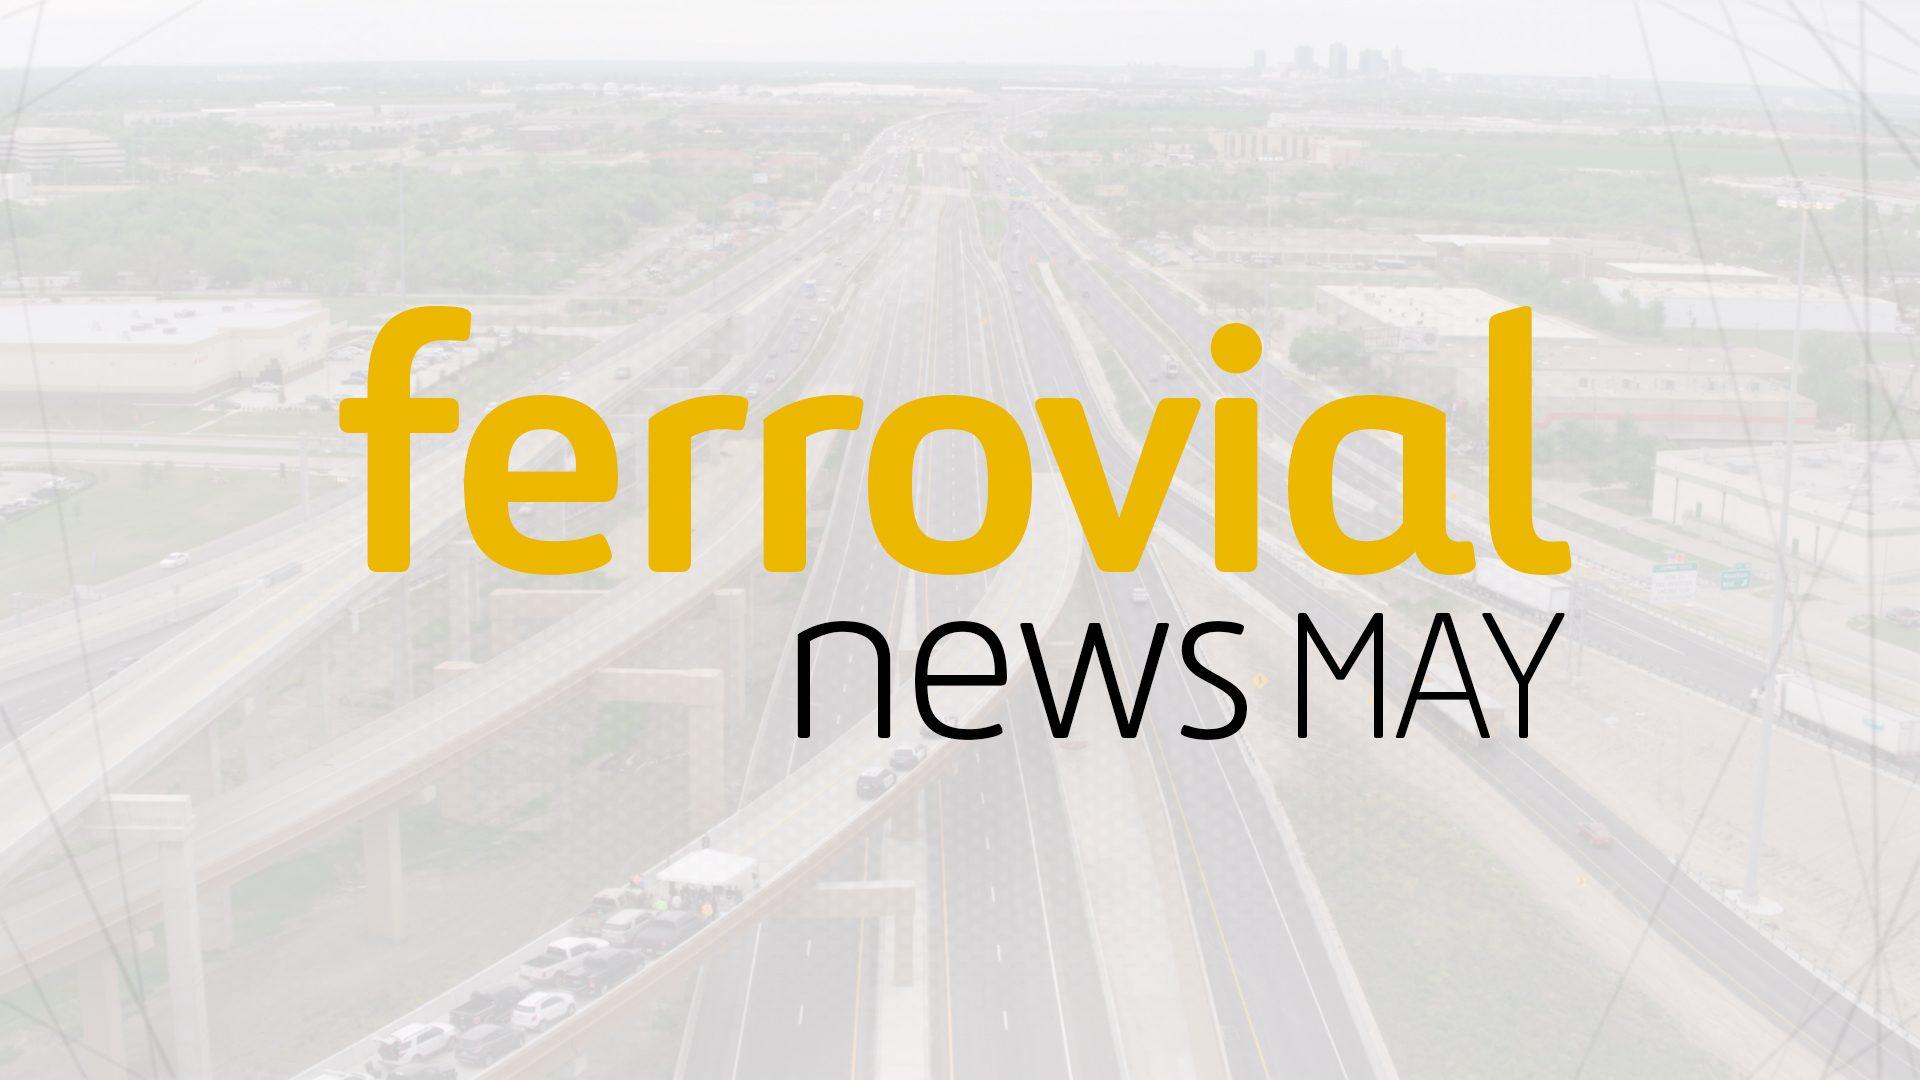 Ferrovial News May 2018